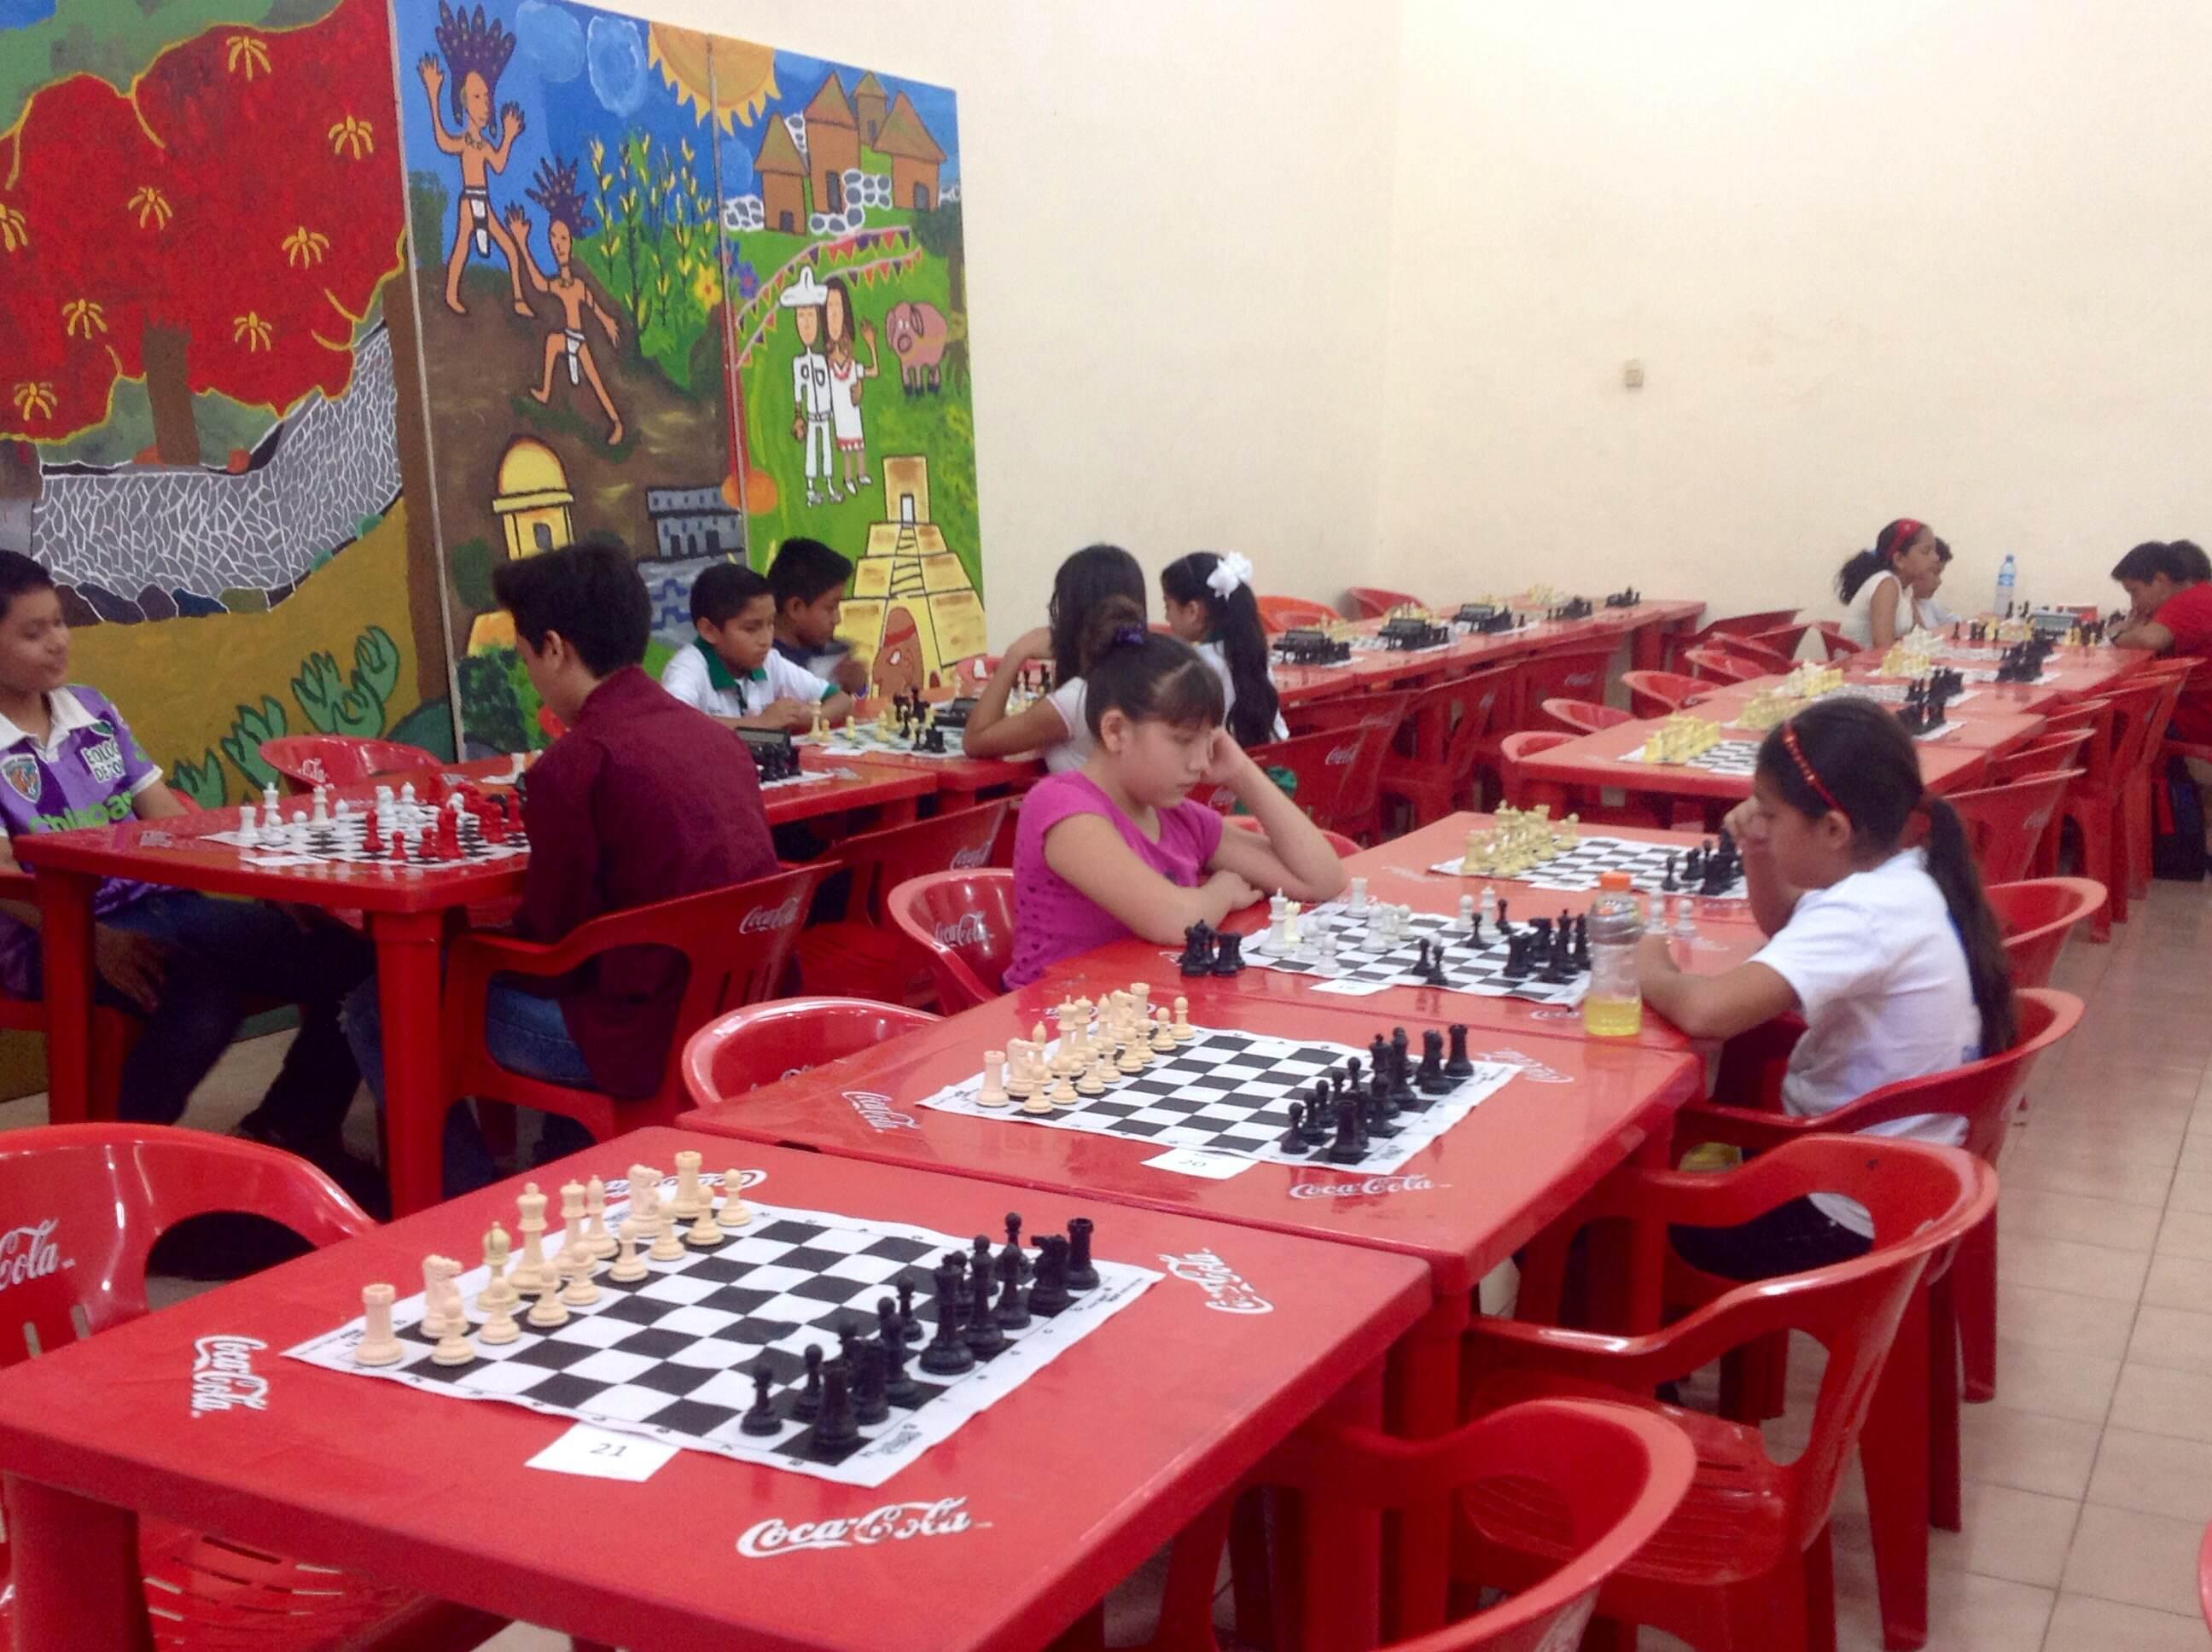 Ejercitan la mente con ajedrez